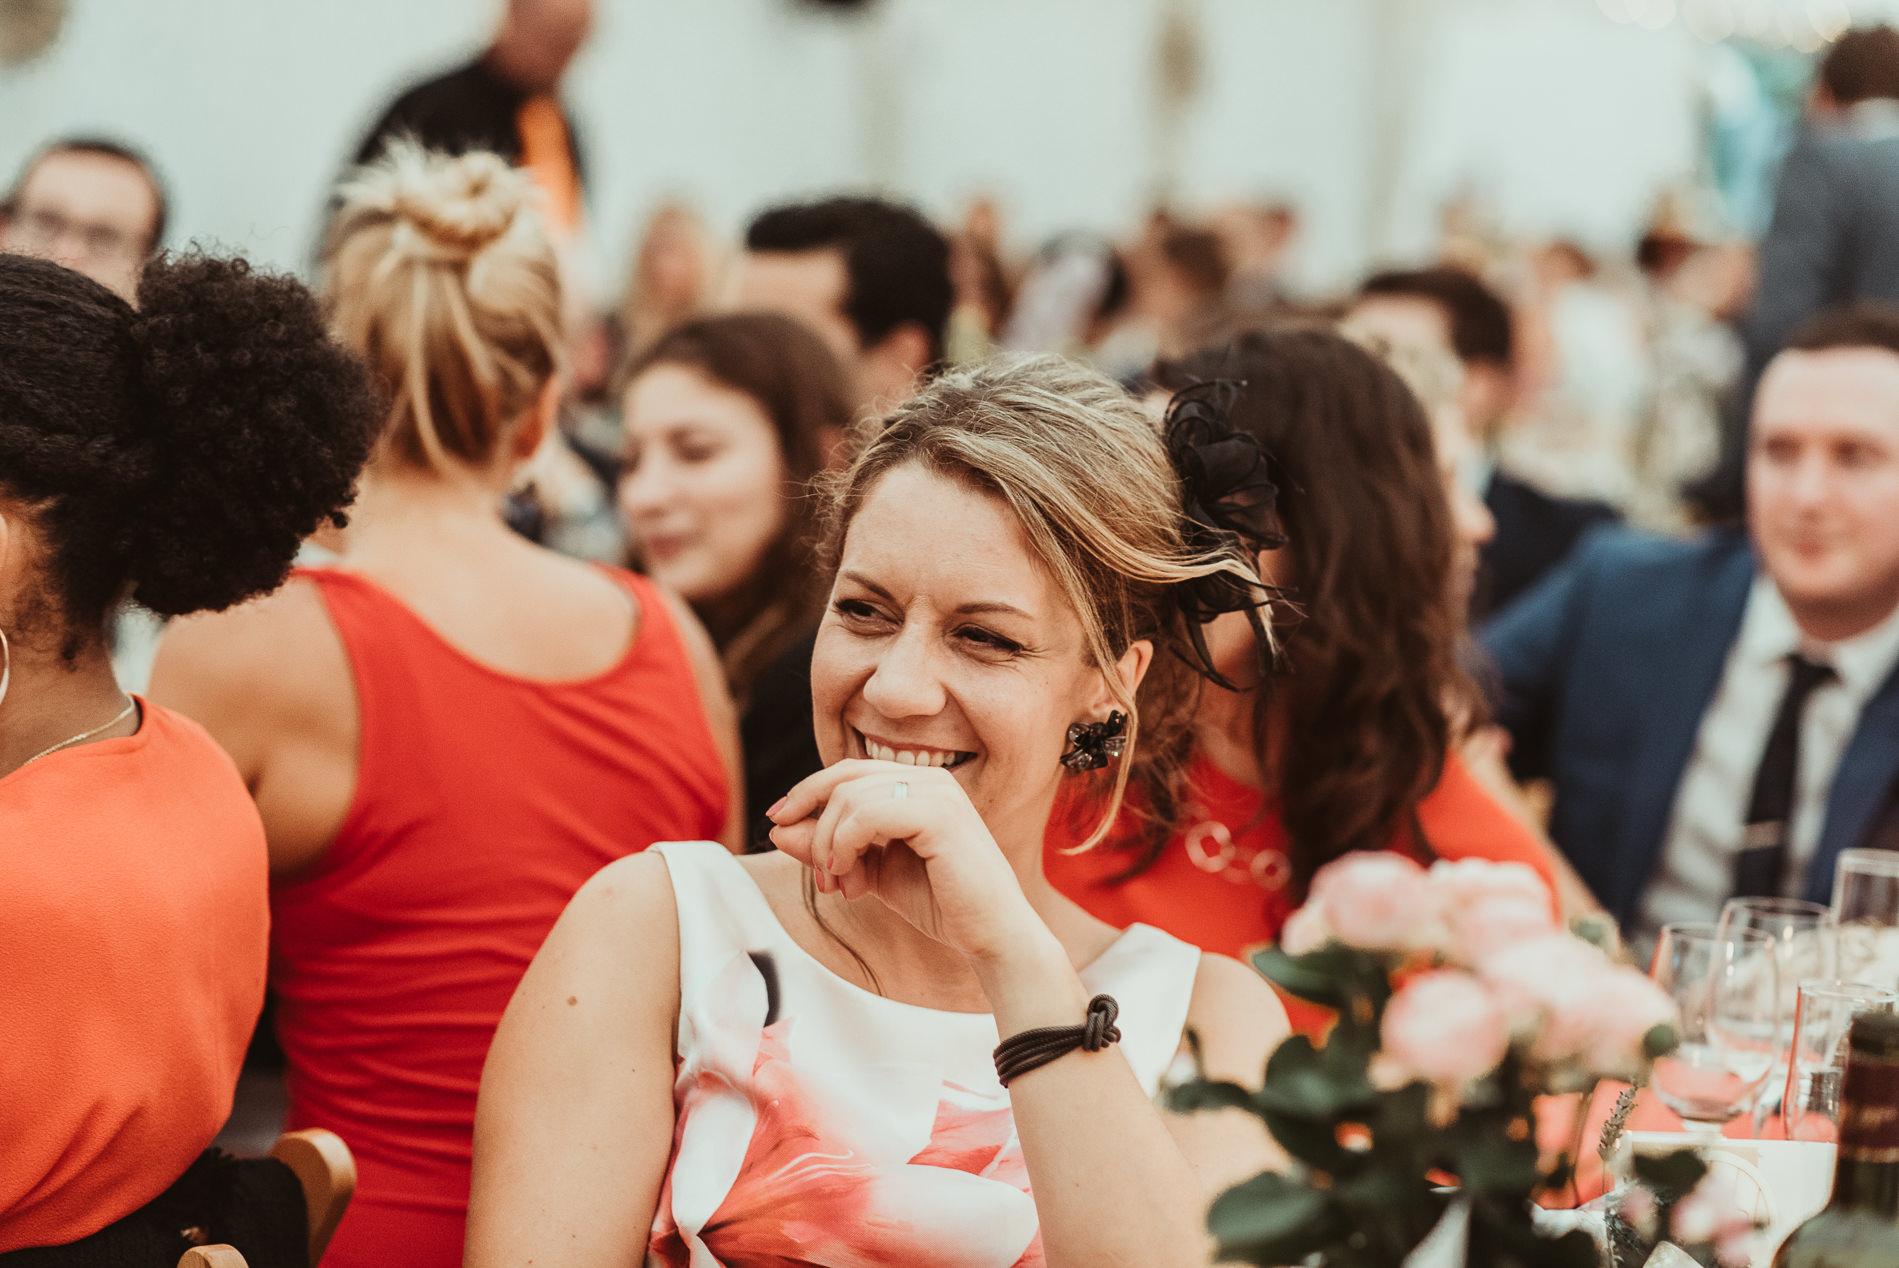 bohemian_wedding_lawshall_church_garden73